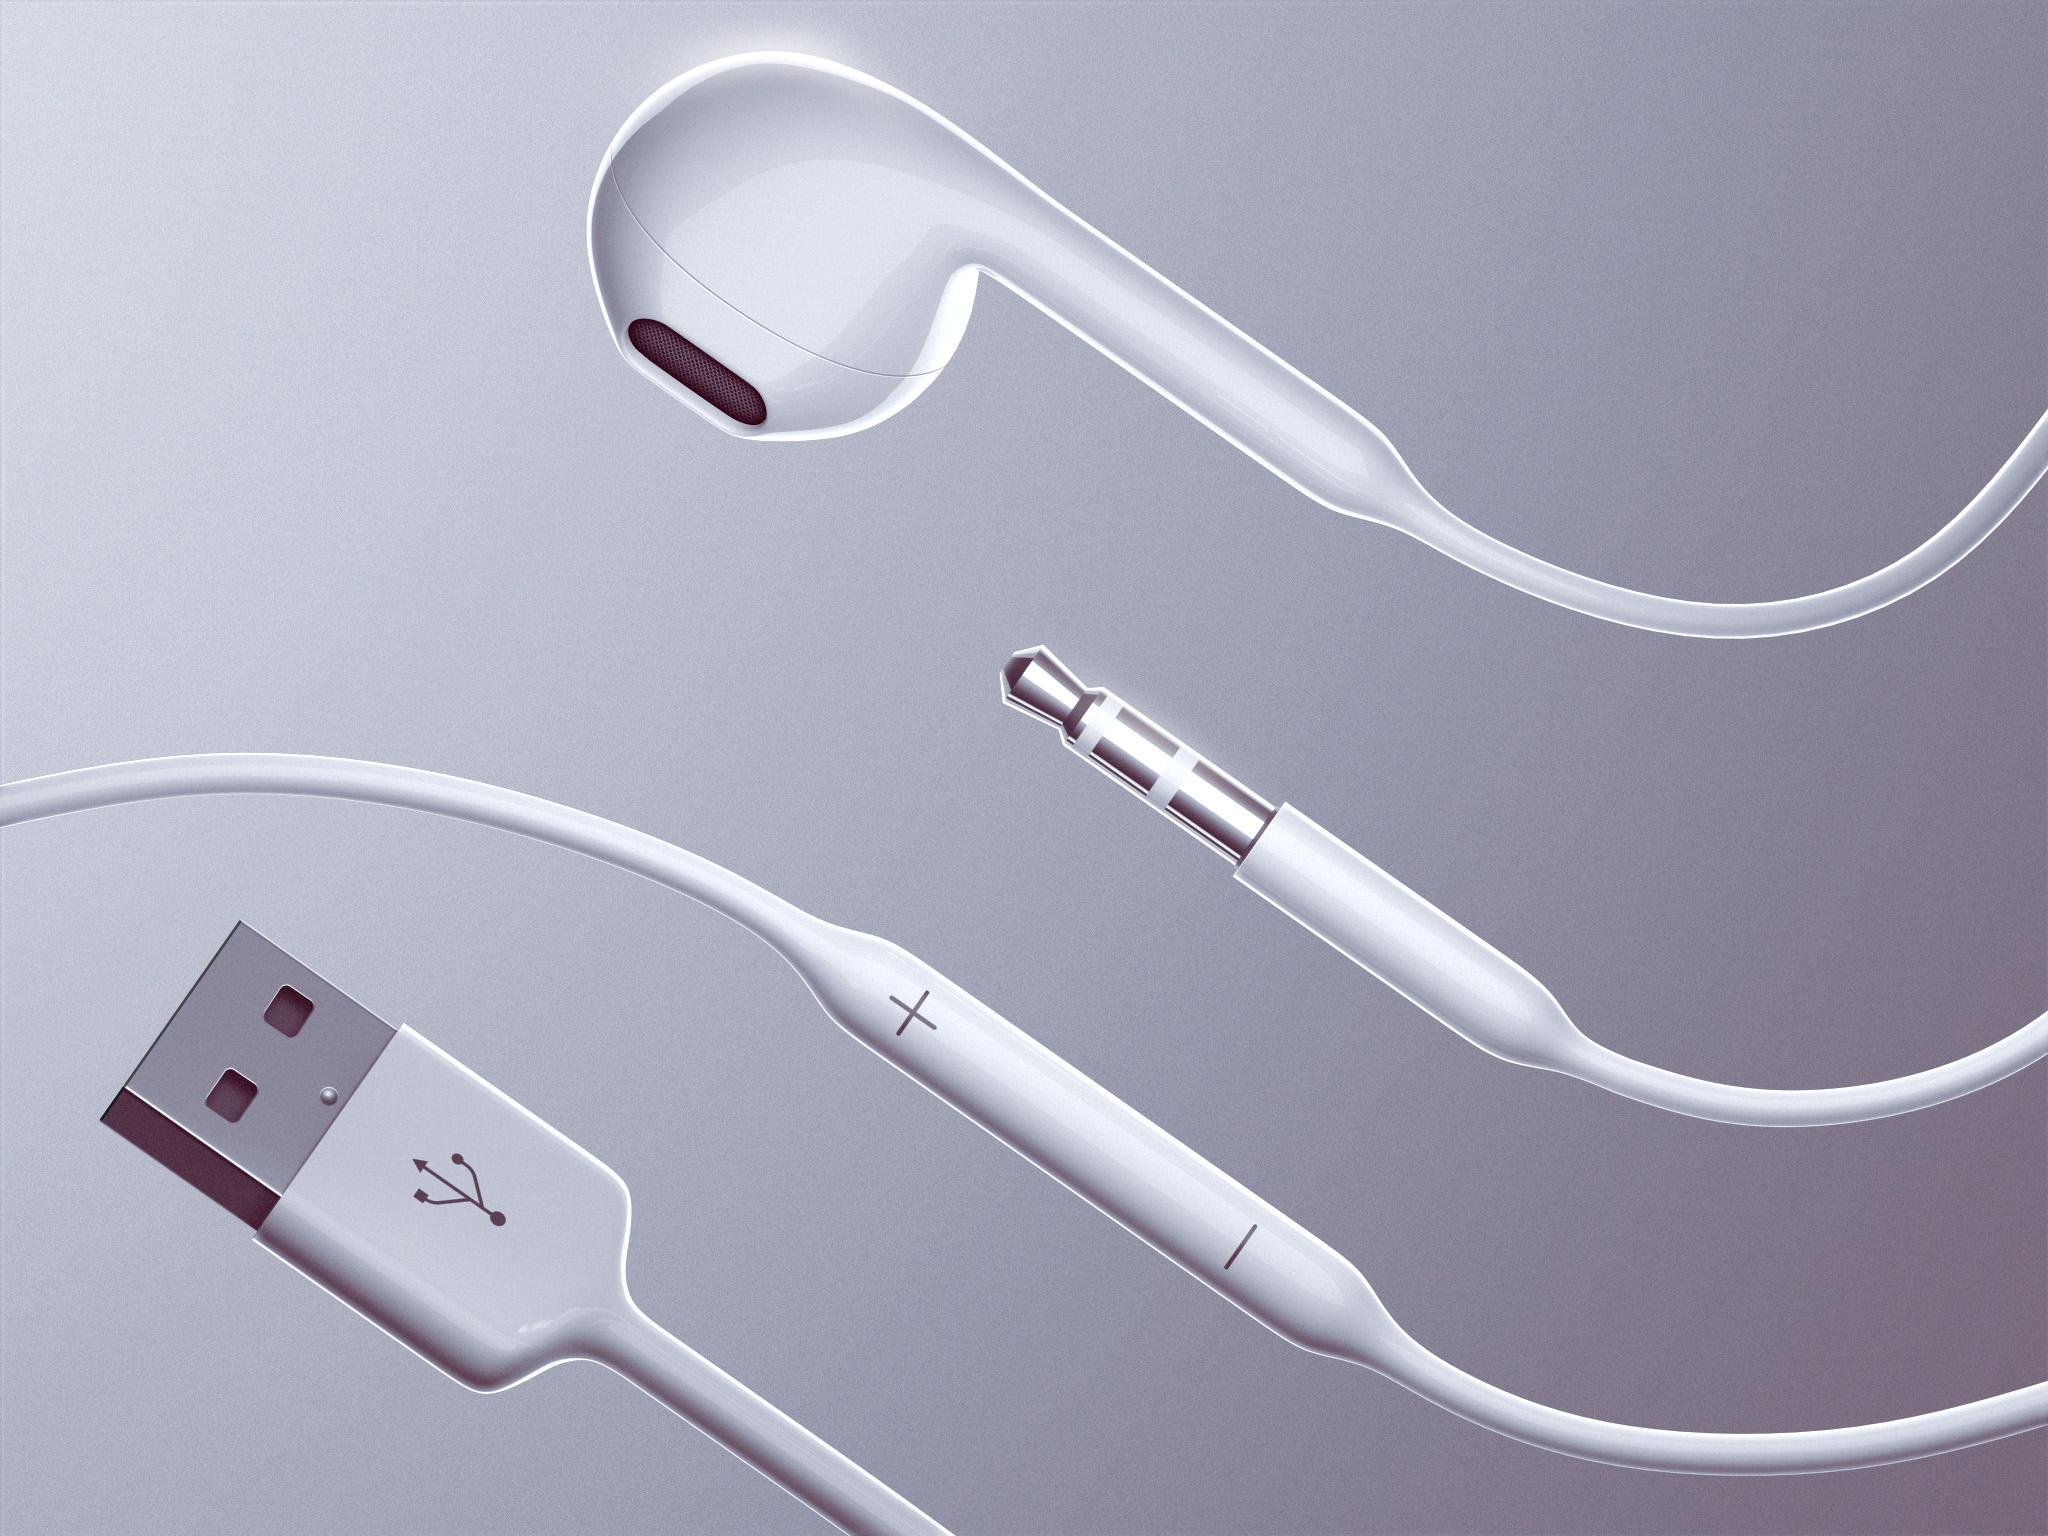 iPad pro concept (Ramotion, USB headphones)